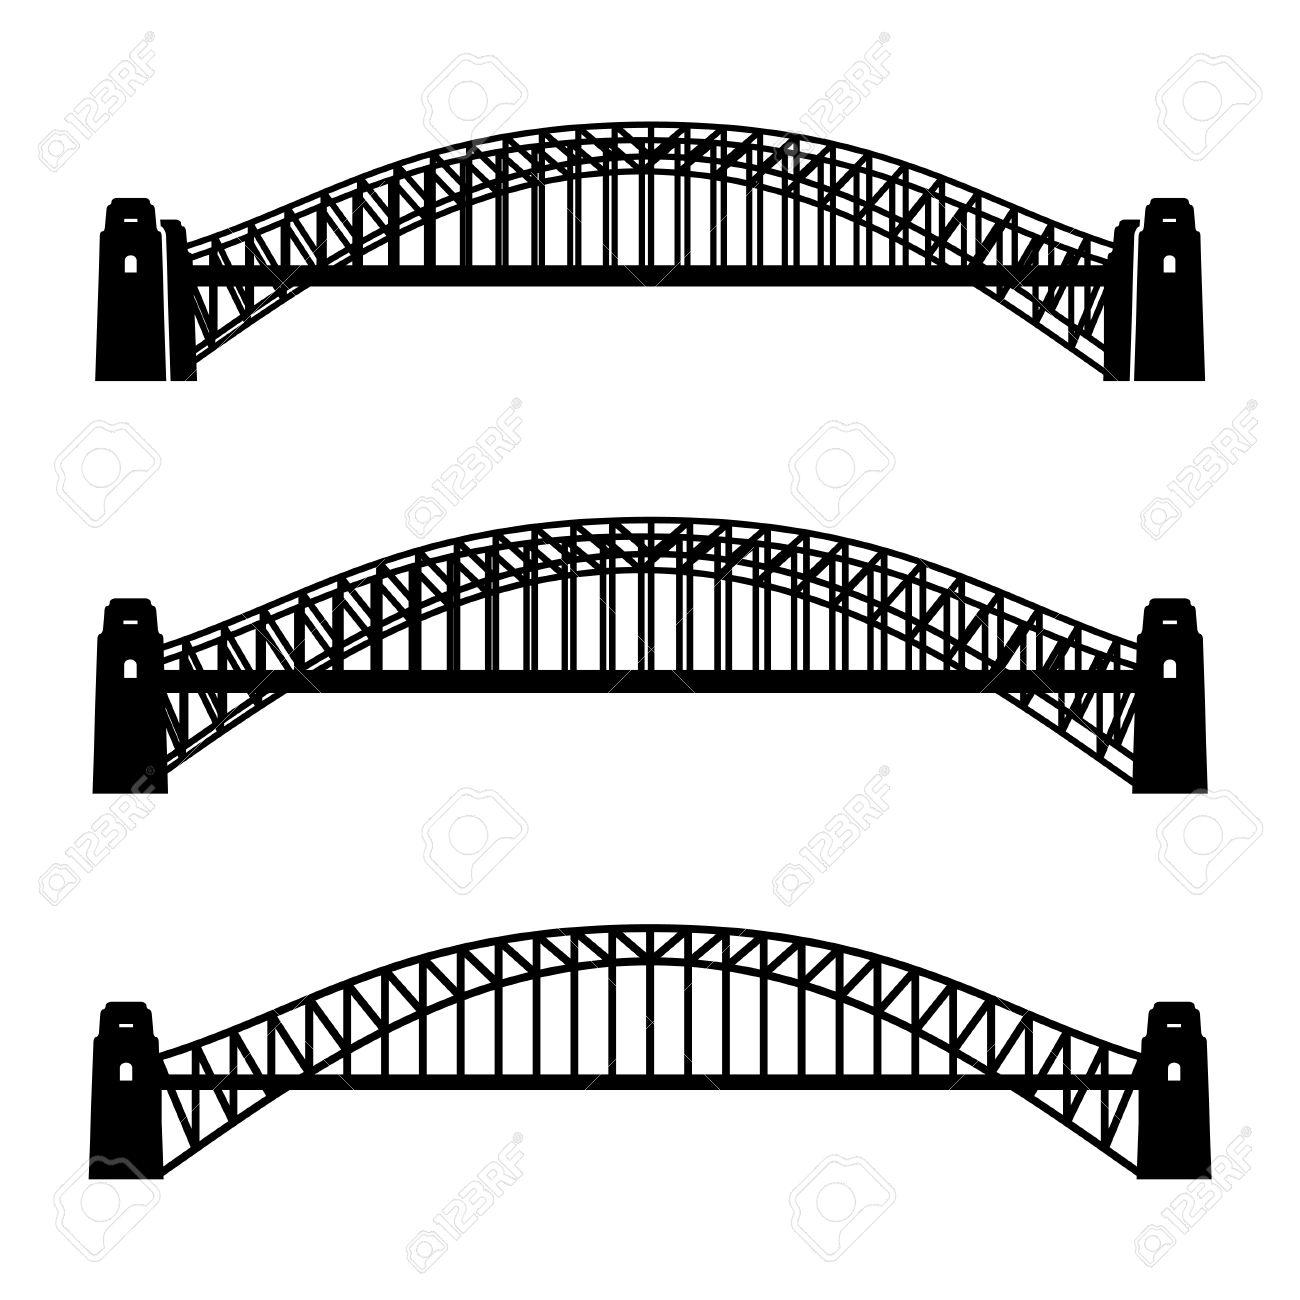 330 Iron Bridge Cliparts, Stock Vector And Royalty Free Iron.